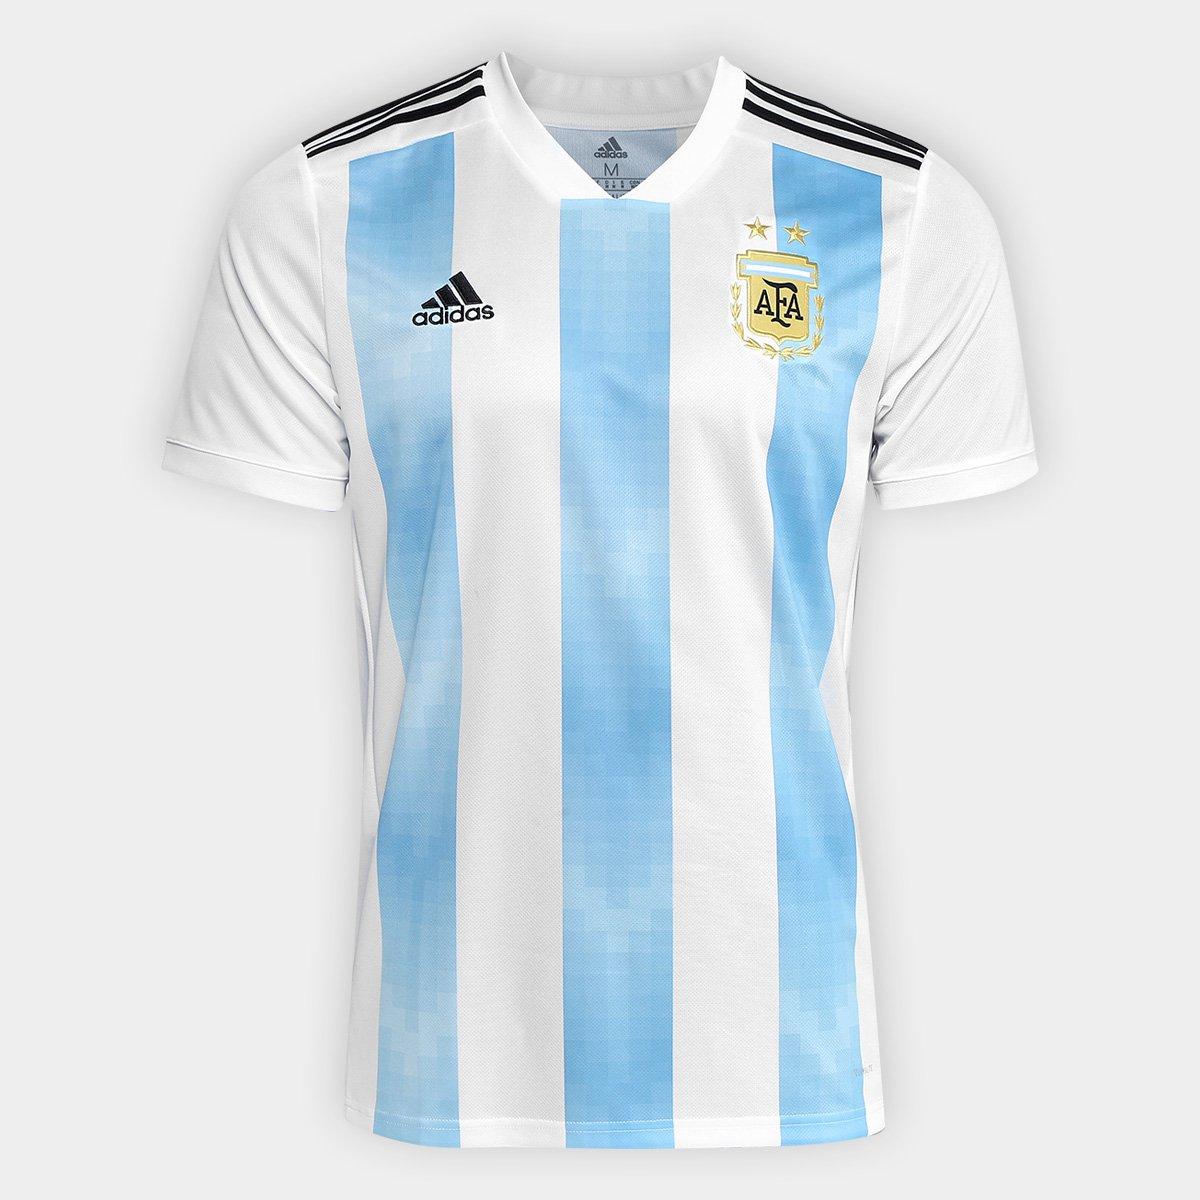 c4ea8b9c3bc7a Camisa Seleção Argentina Home 2018 s n° Torcedor Adidas Masculina